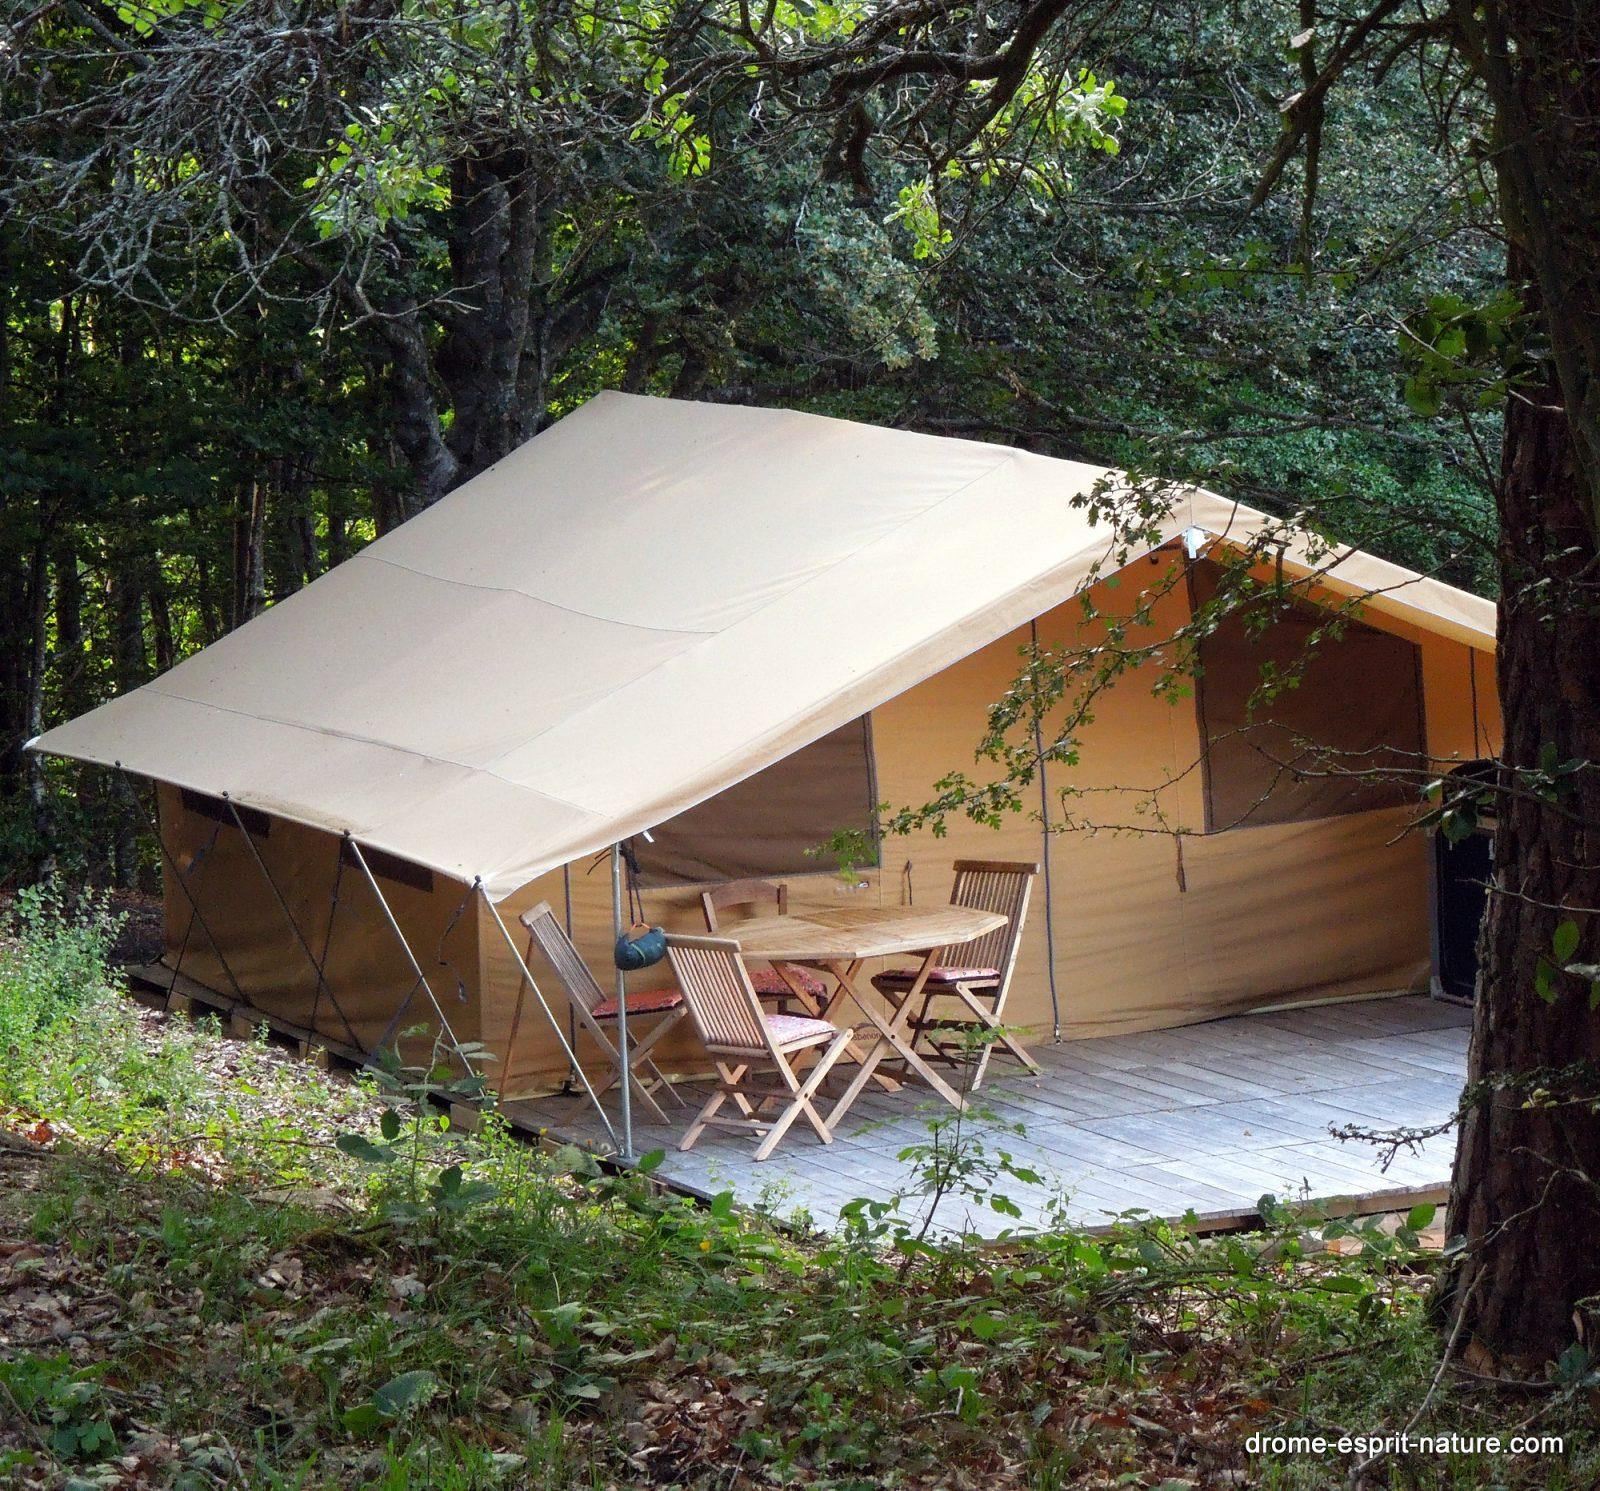 Camping Drôme Esprit Nature